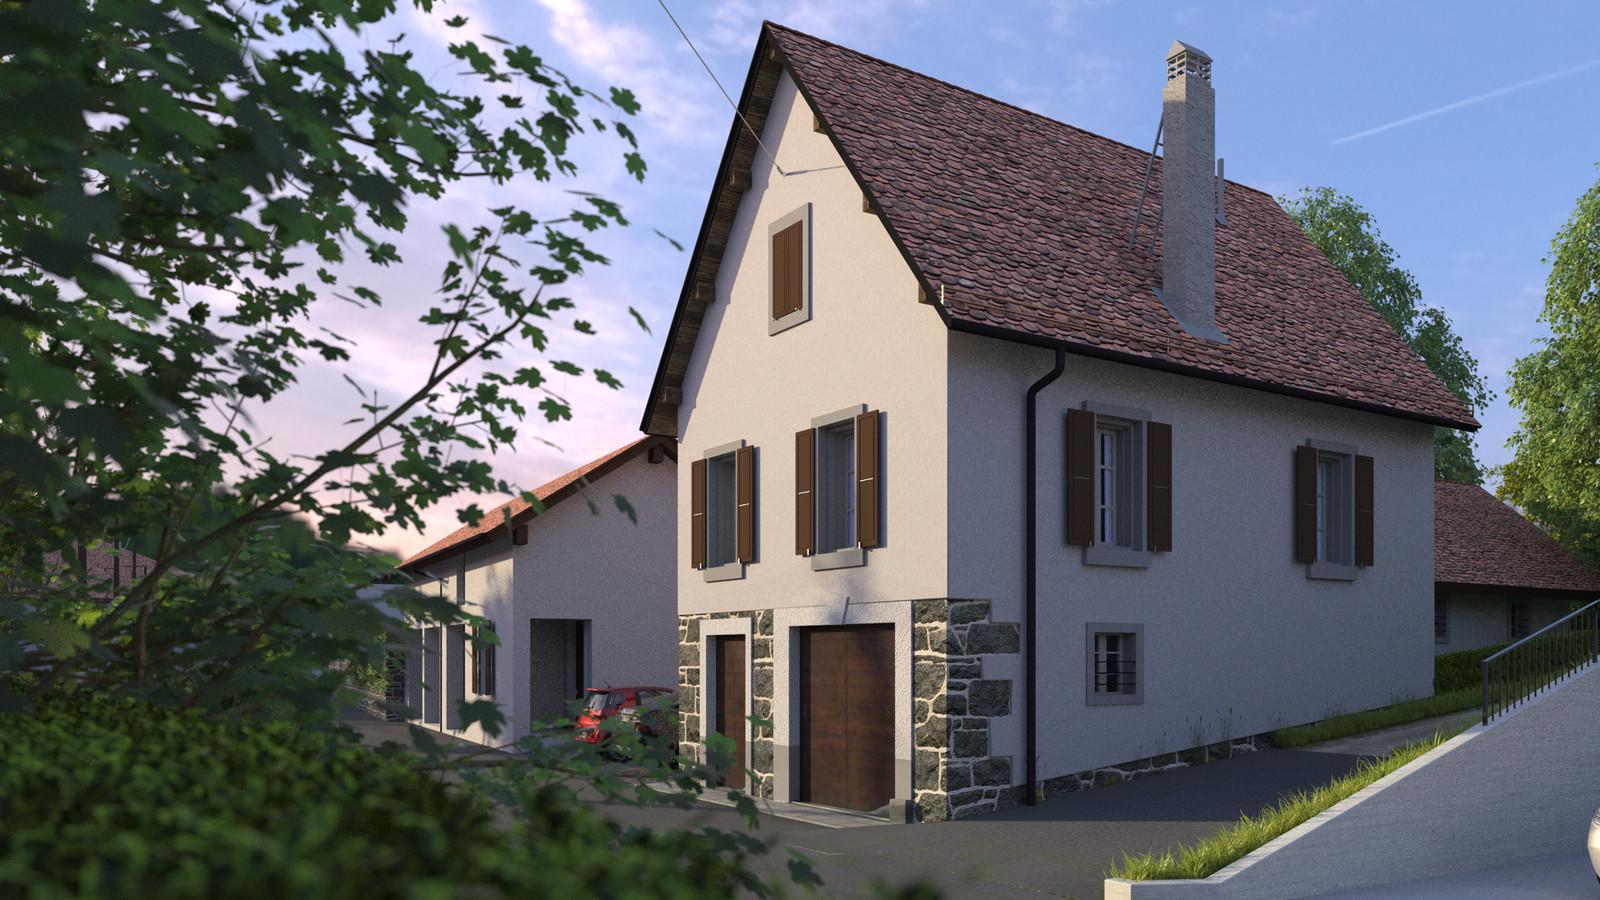 SketchUp + Thea Render  Little Swiss House Scene 28 0707 Dawn Sun 01 HD 1920 x 1080 Presto MC